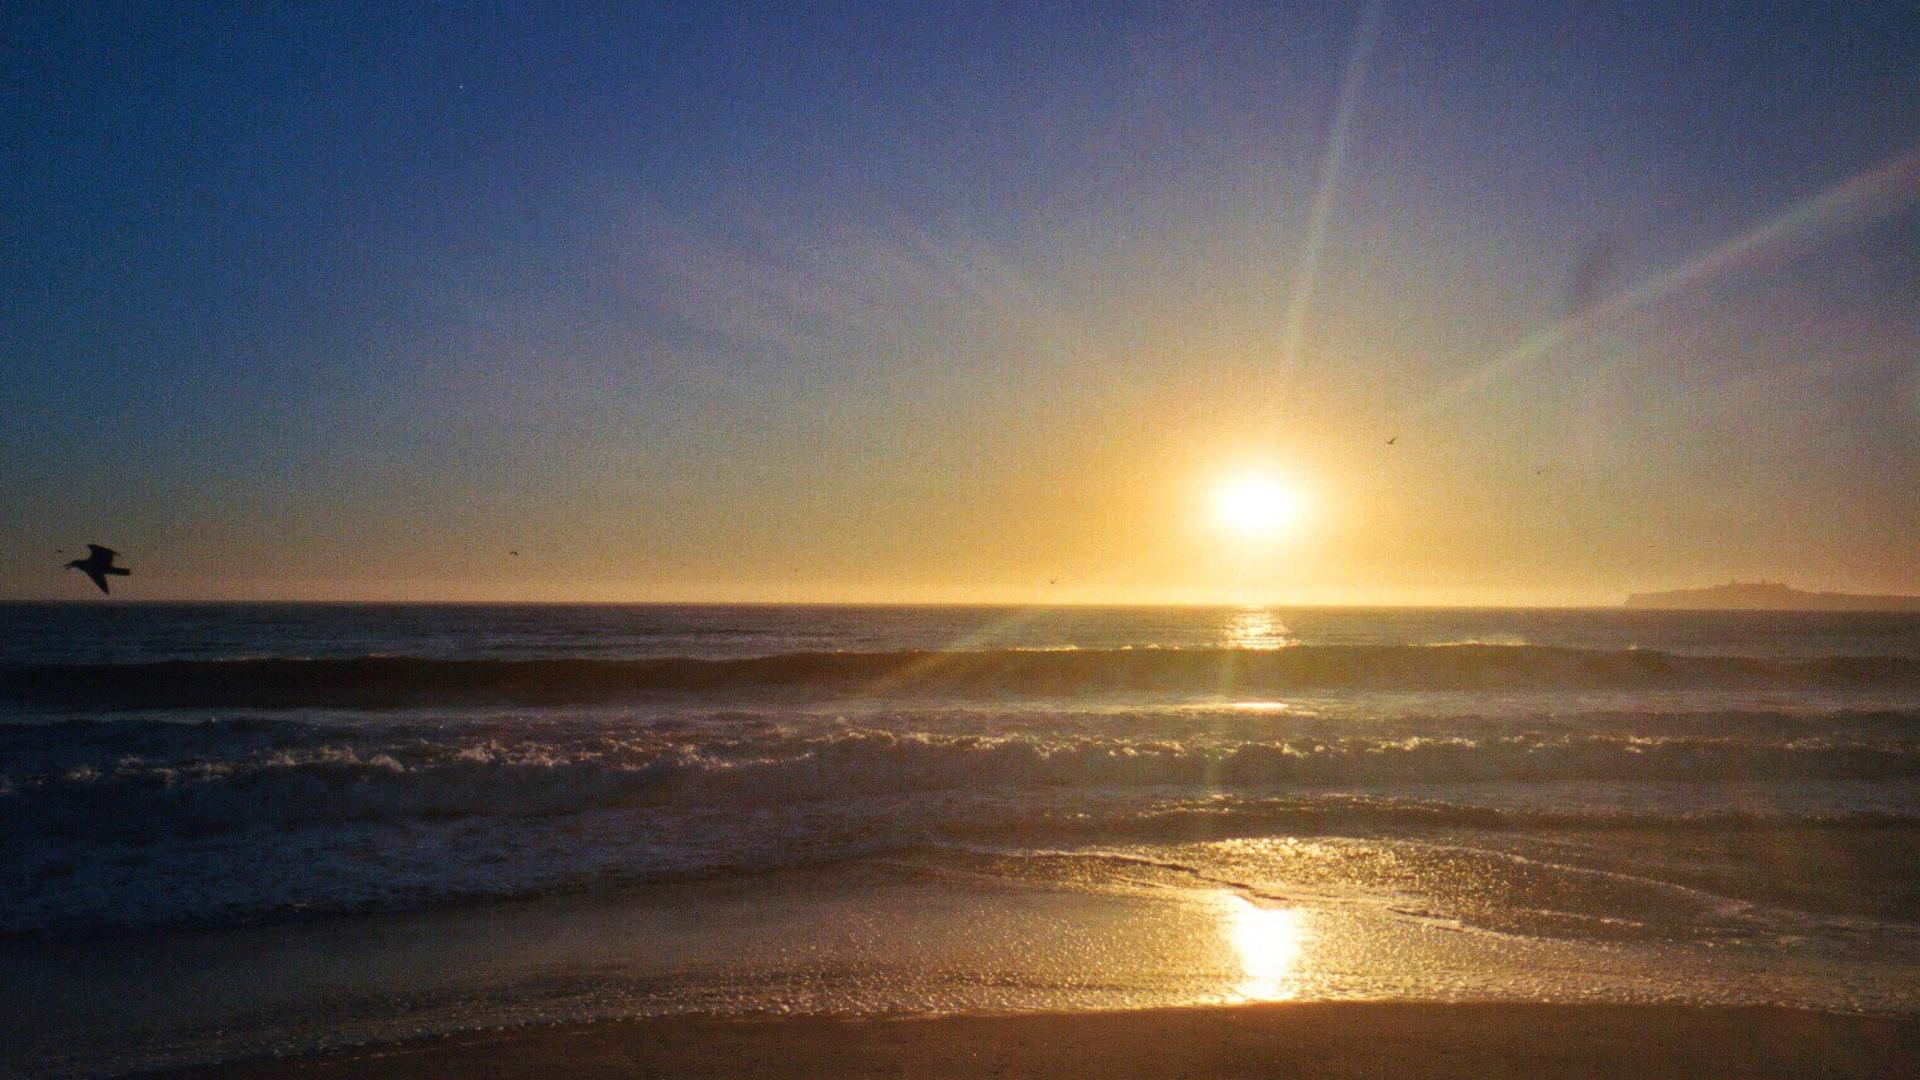 Sunset at the beach | water, sunset, sun, sky